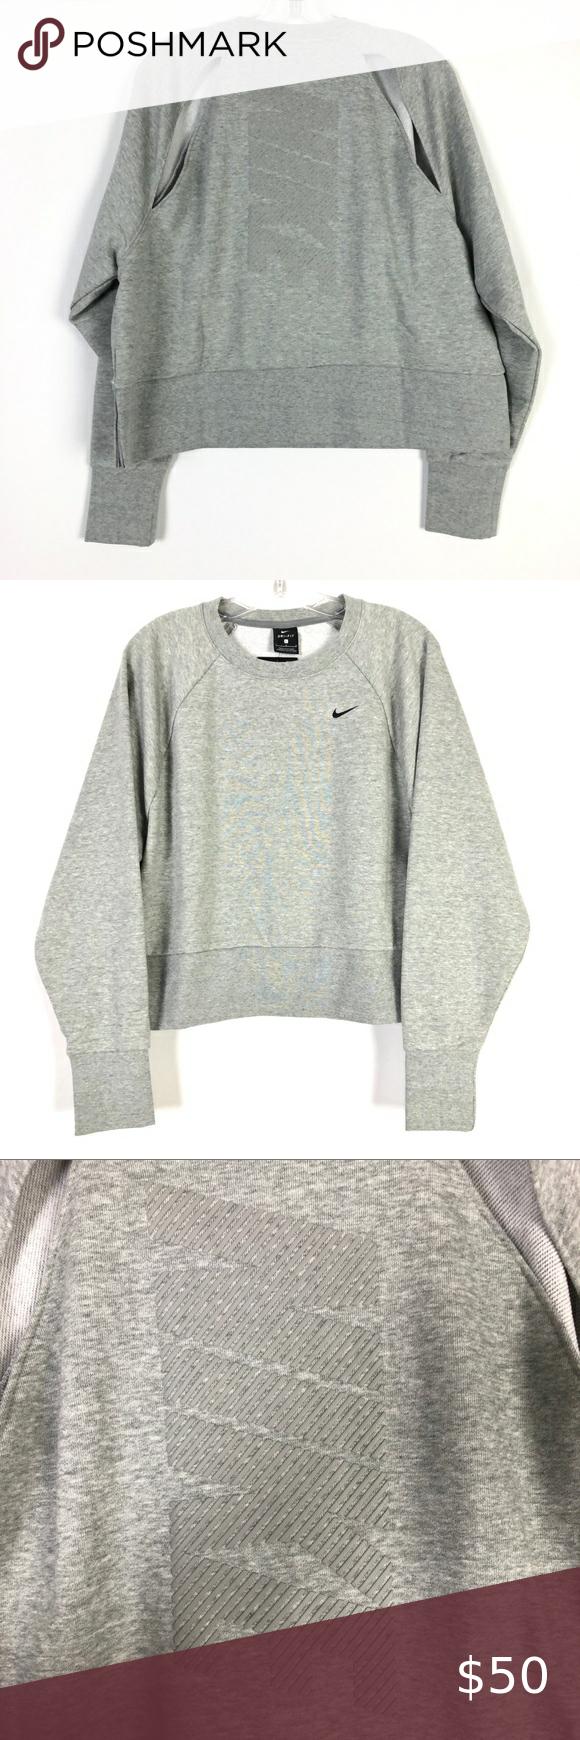 Nike Dri Fit Fleece Cropped Crew Heather Gray Top Clothes Design Grey Top Heather Grey [ 1740 x 580 Pixel ]